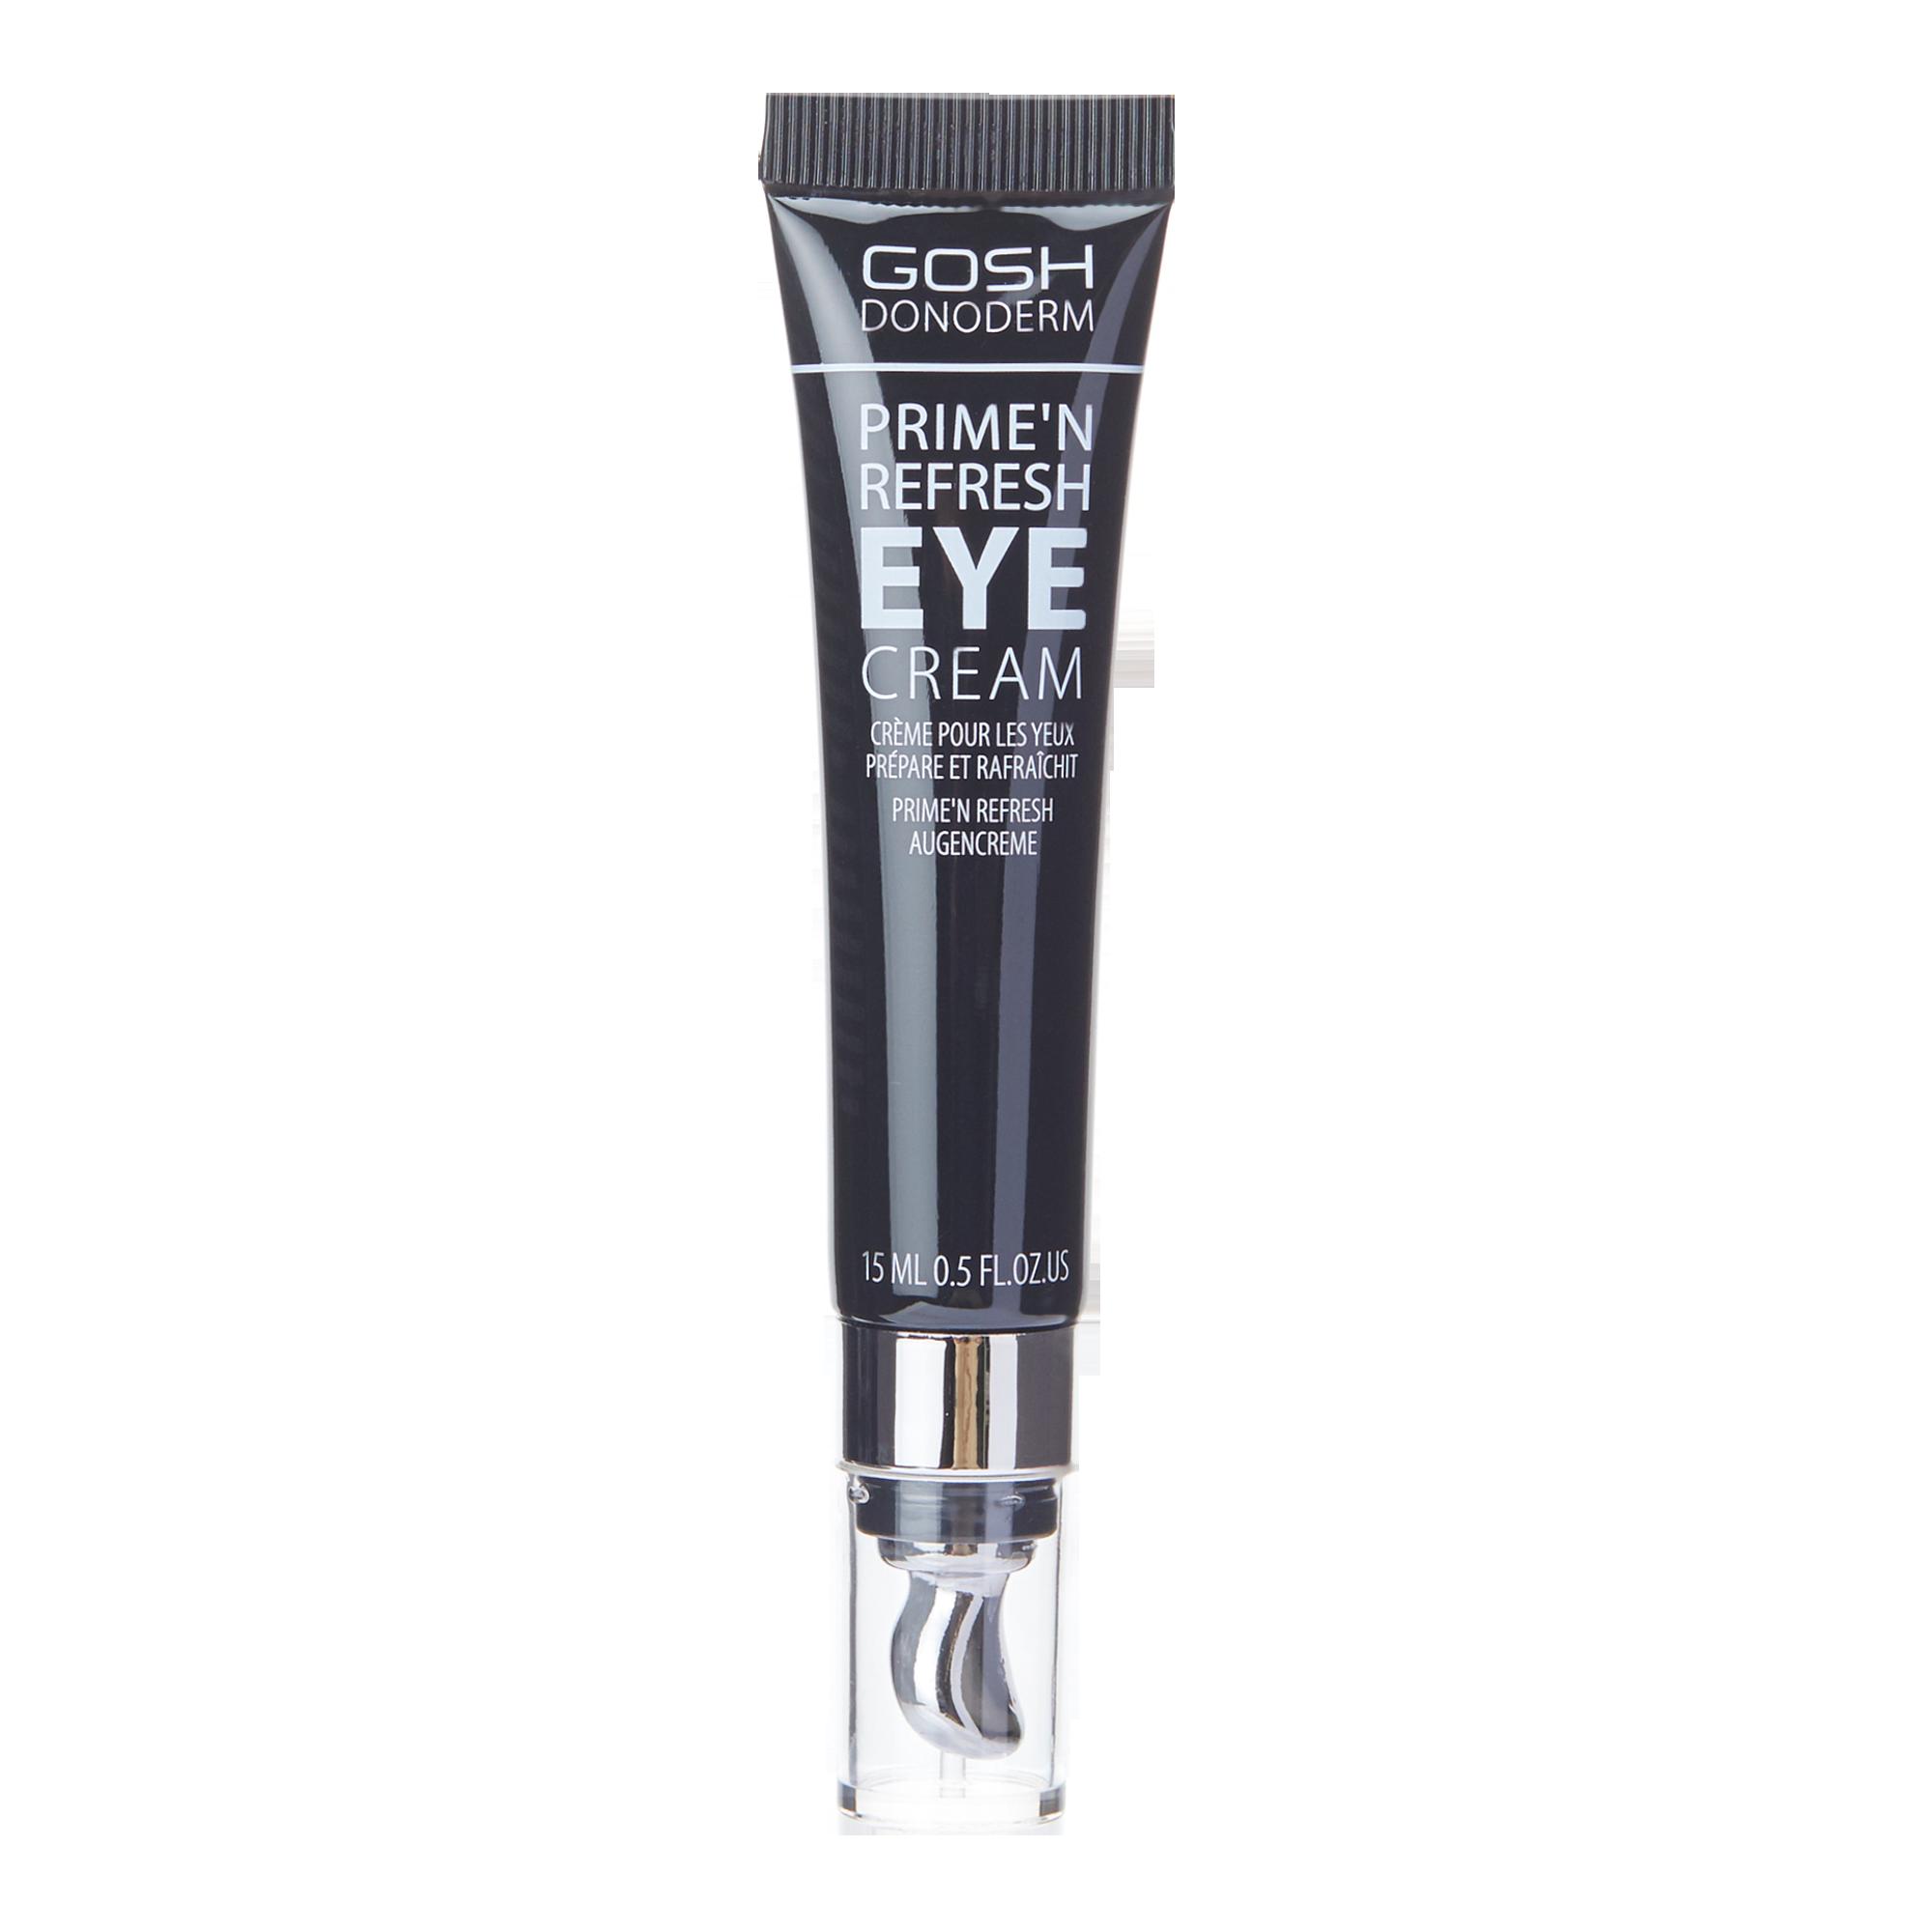 GOSH - Donoderm Eye Cream 15 ml